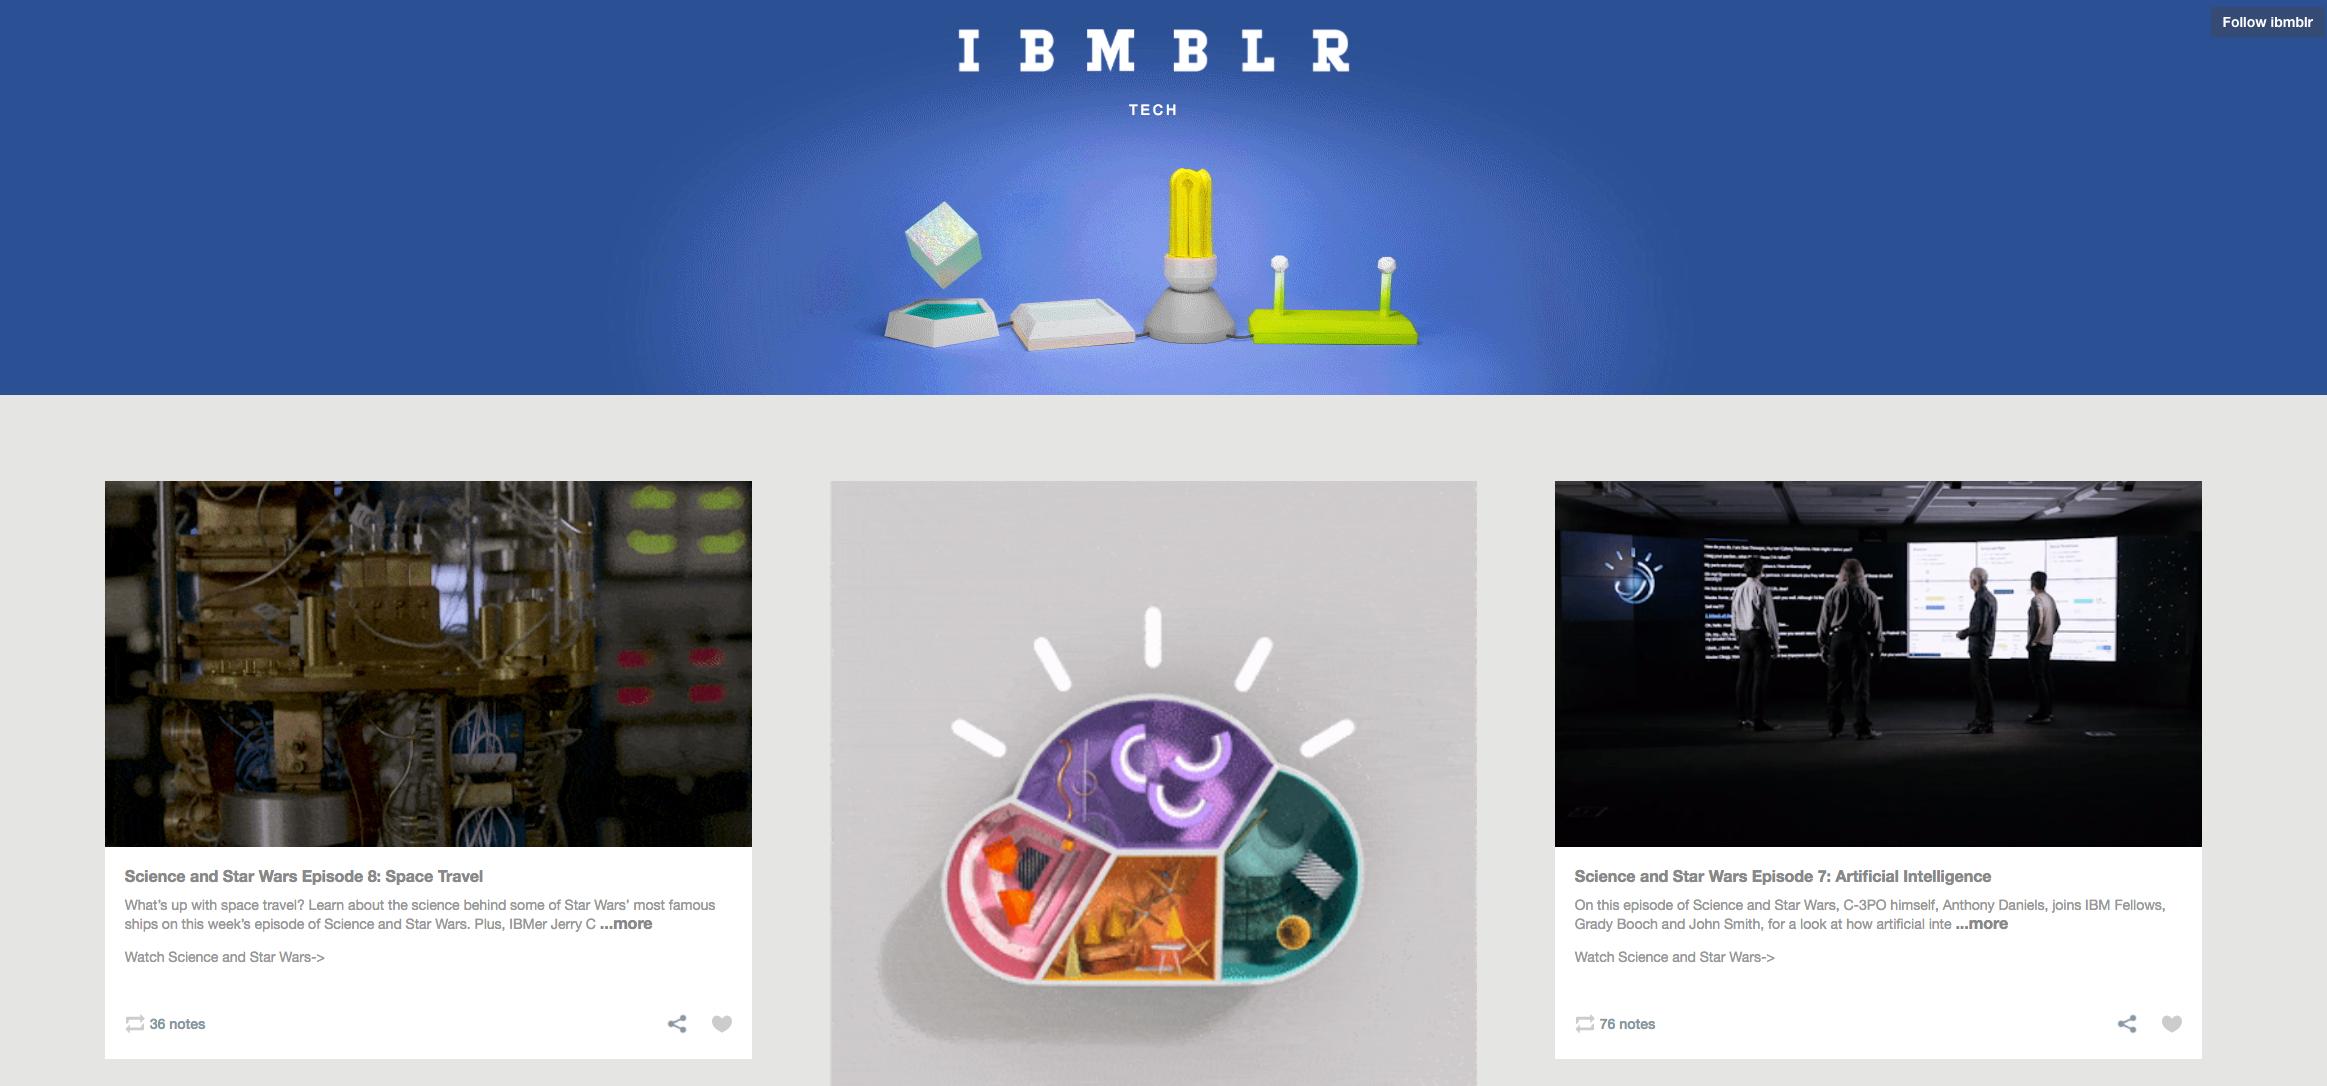 IBMBLR Inspiring Content Marketing